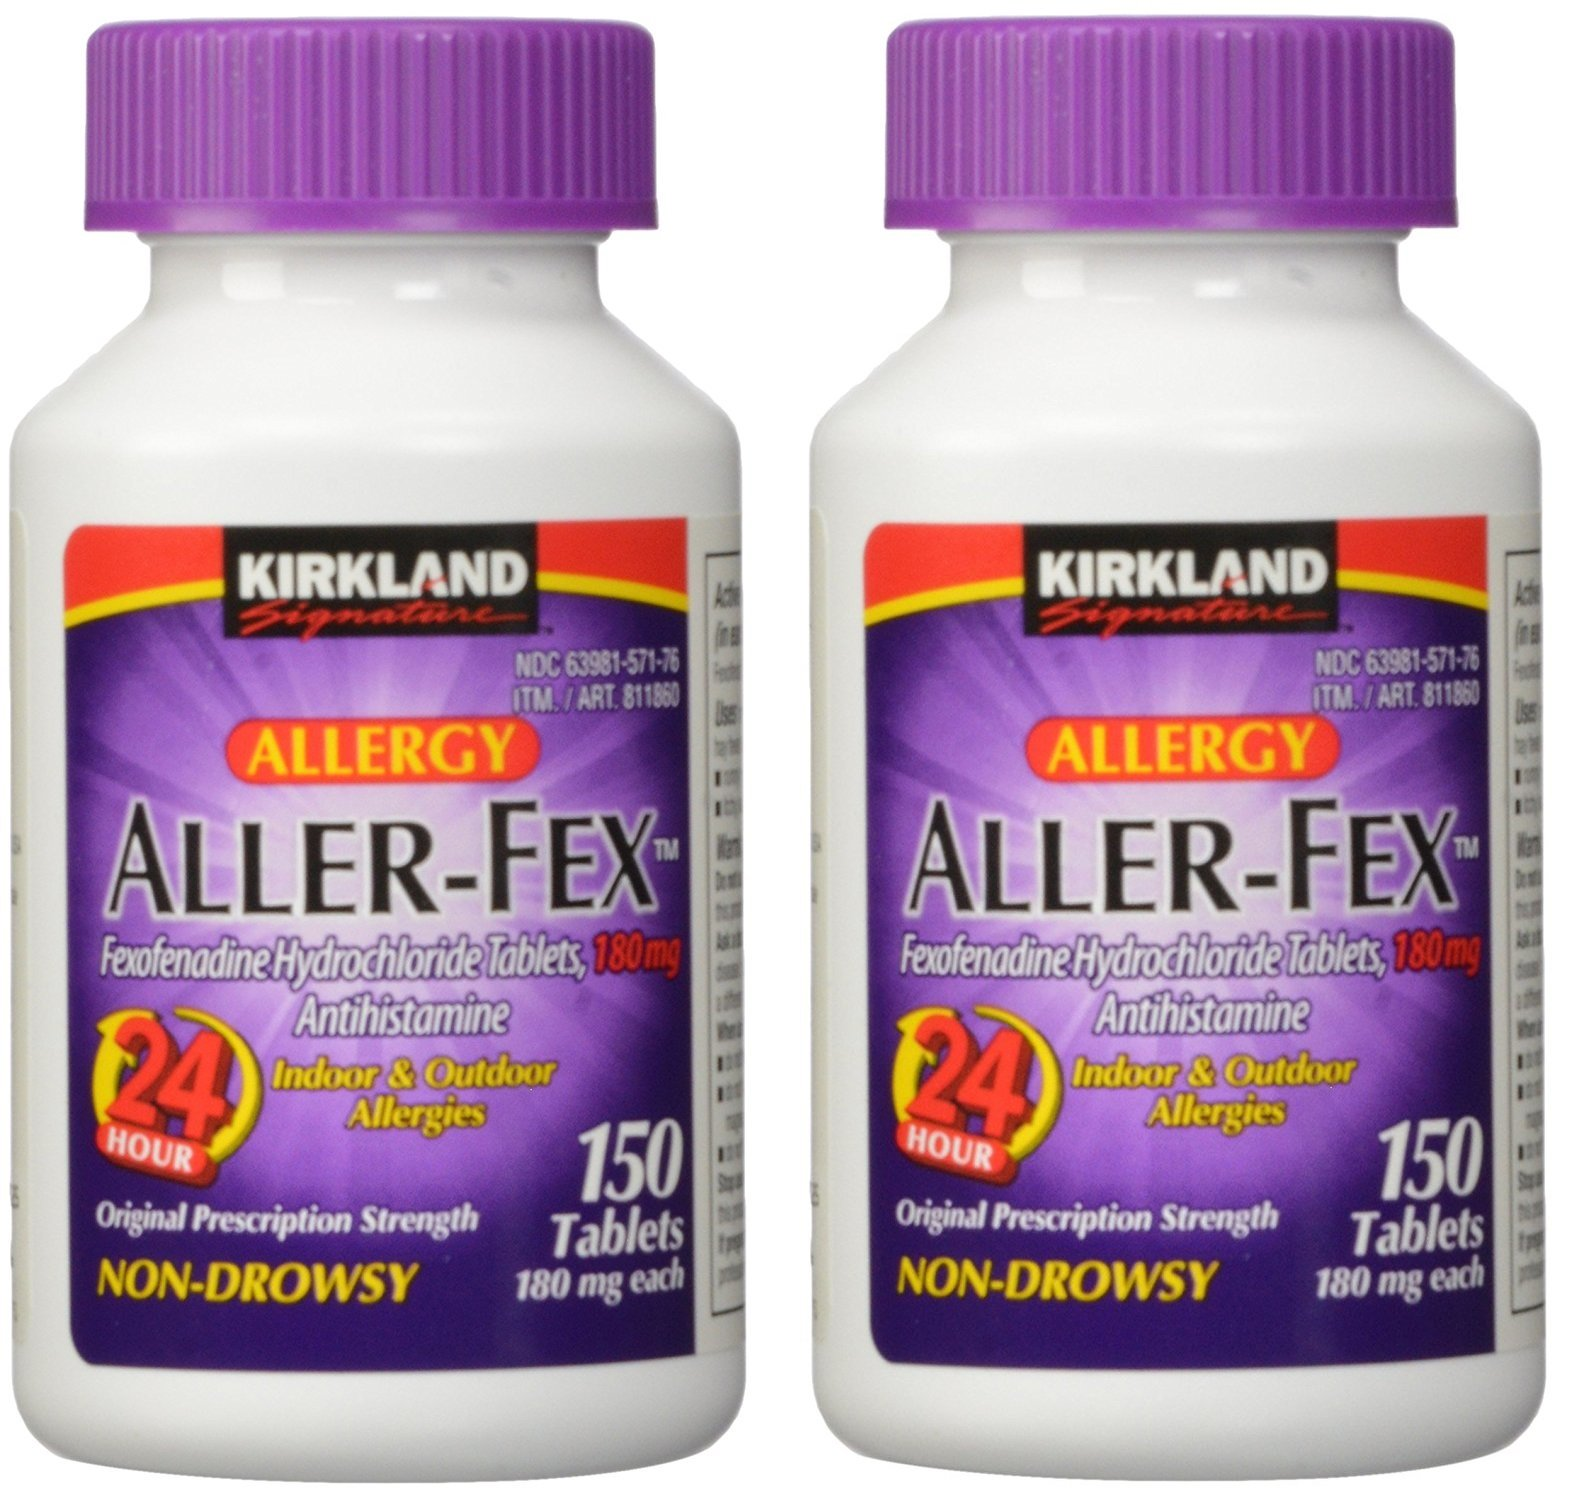 Kirkland Signature Aller-Fex, 180 mg, 150 Count (2 Pack) by Kirkland Signature